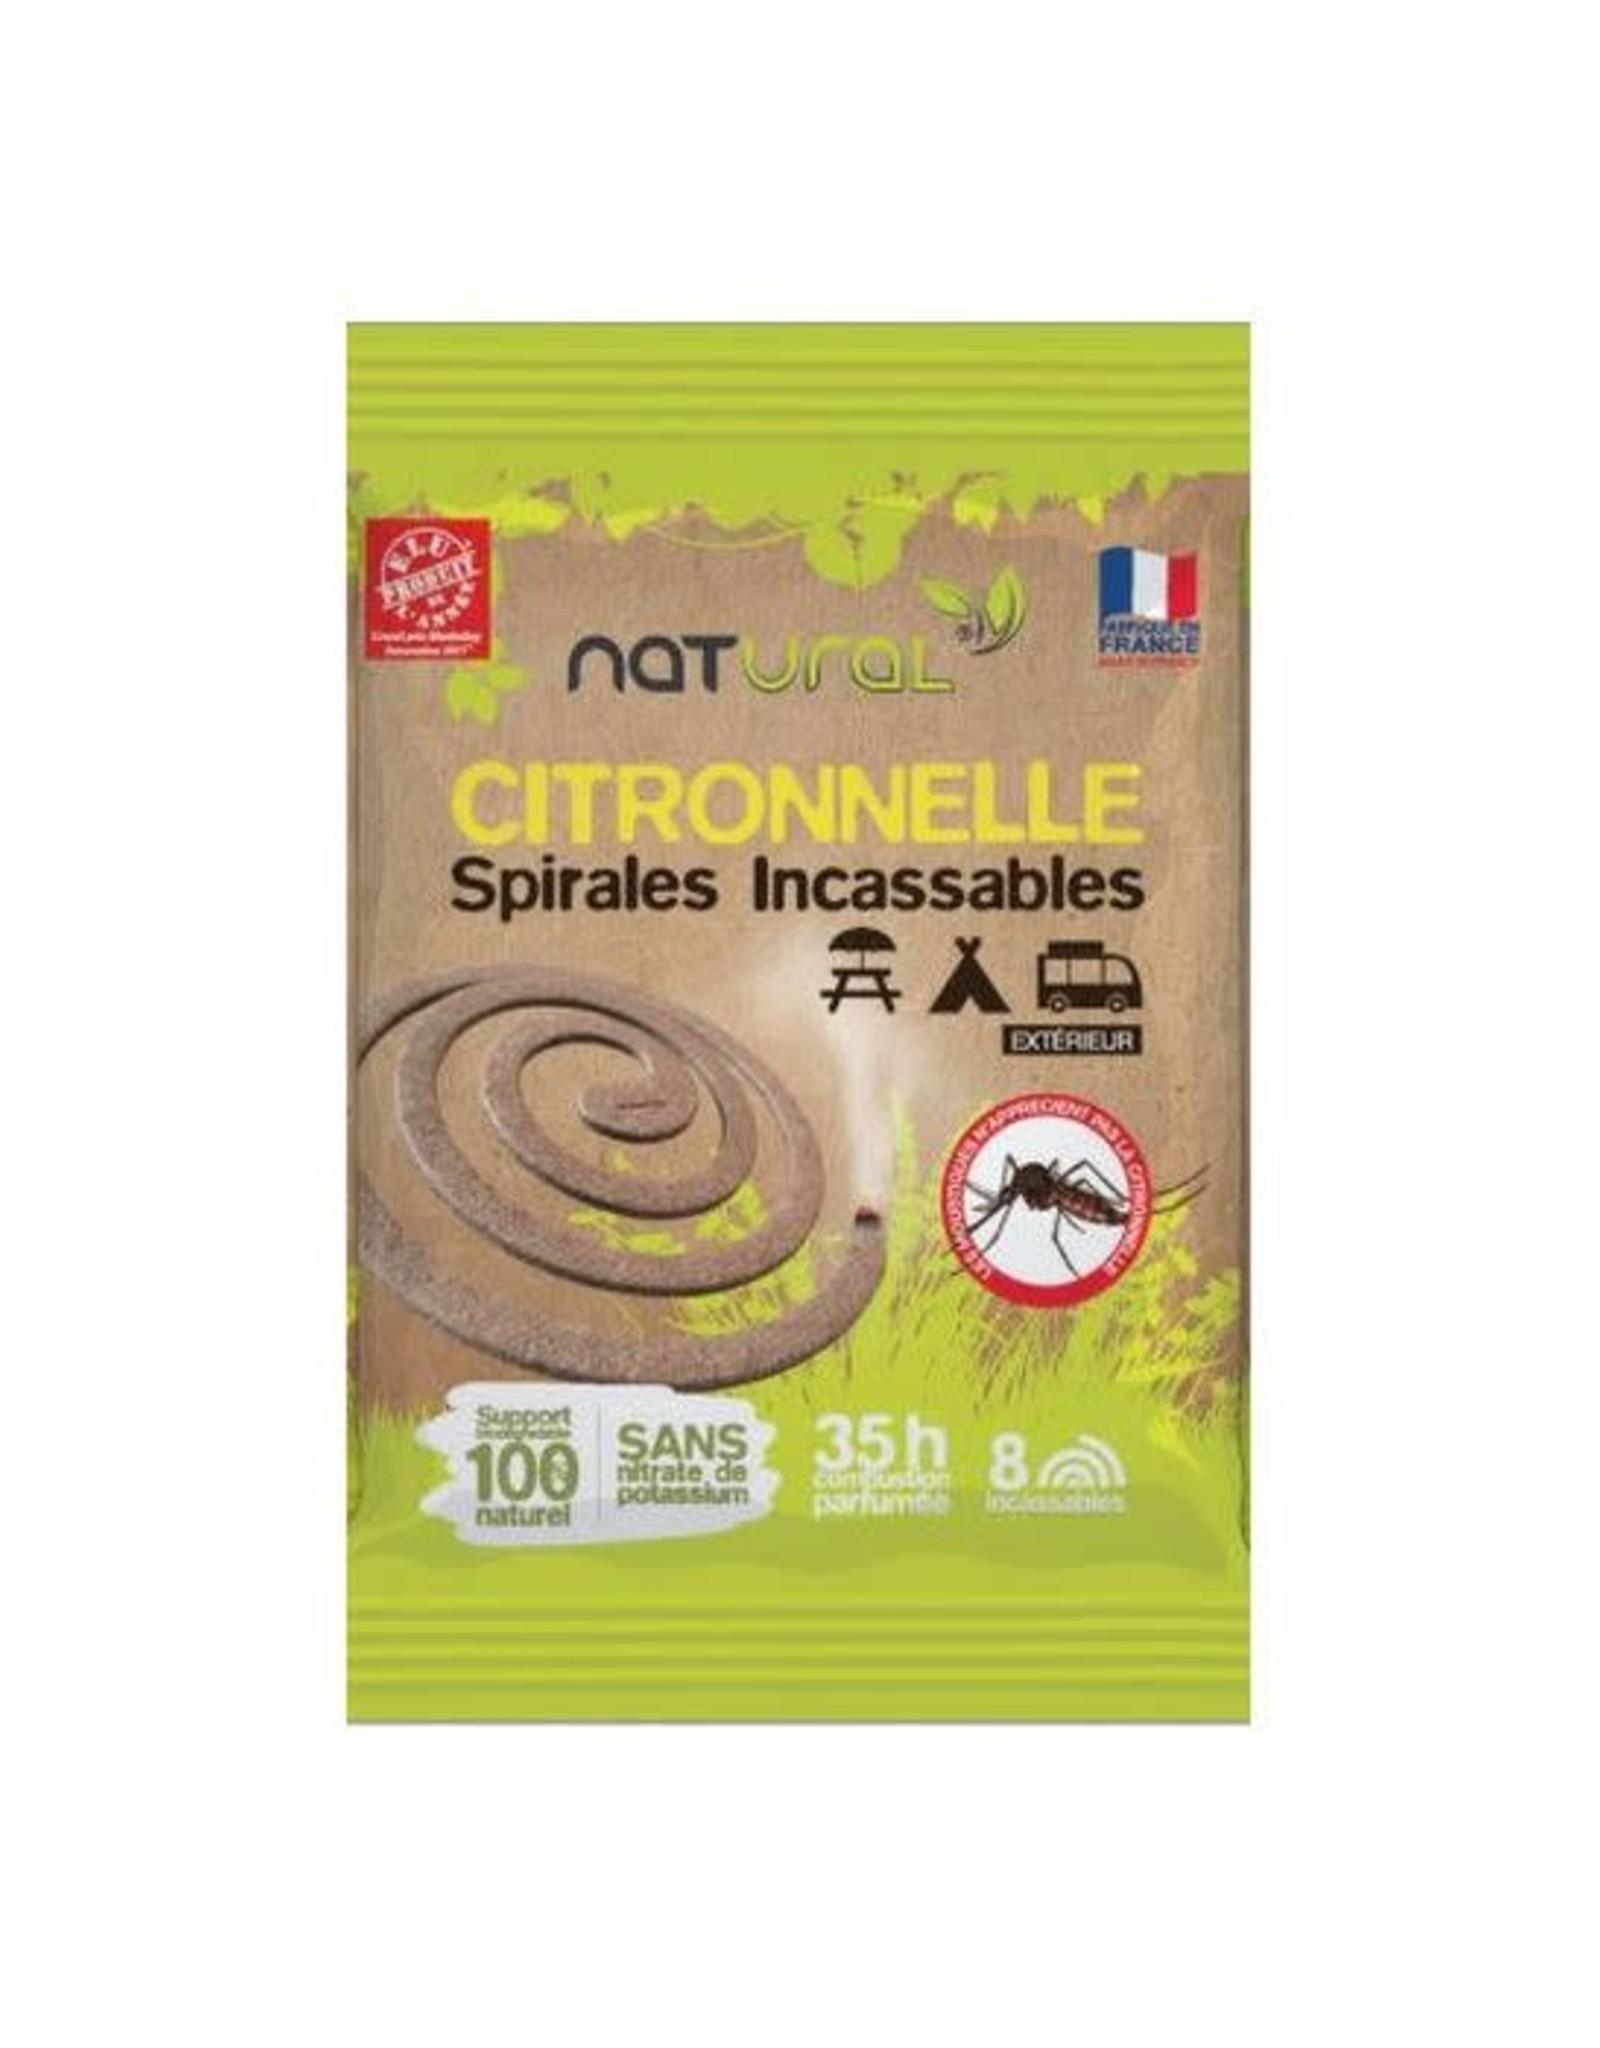 Natural Anti Mug Spiraal Citronella. 8 stuks